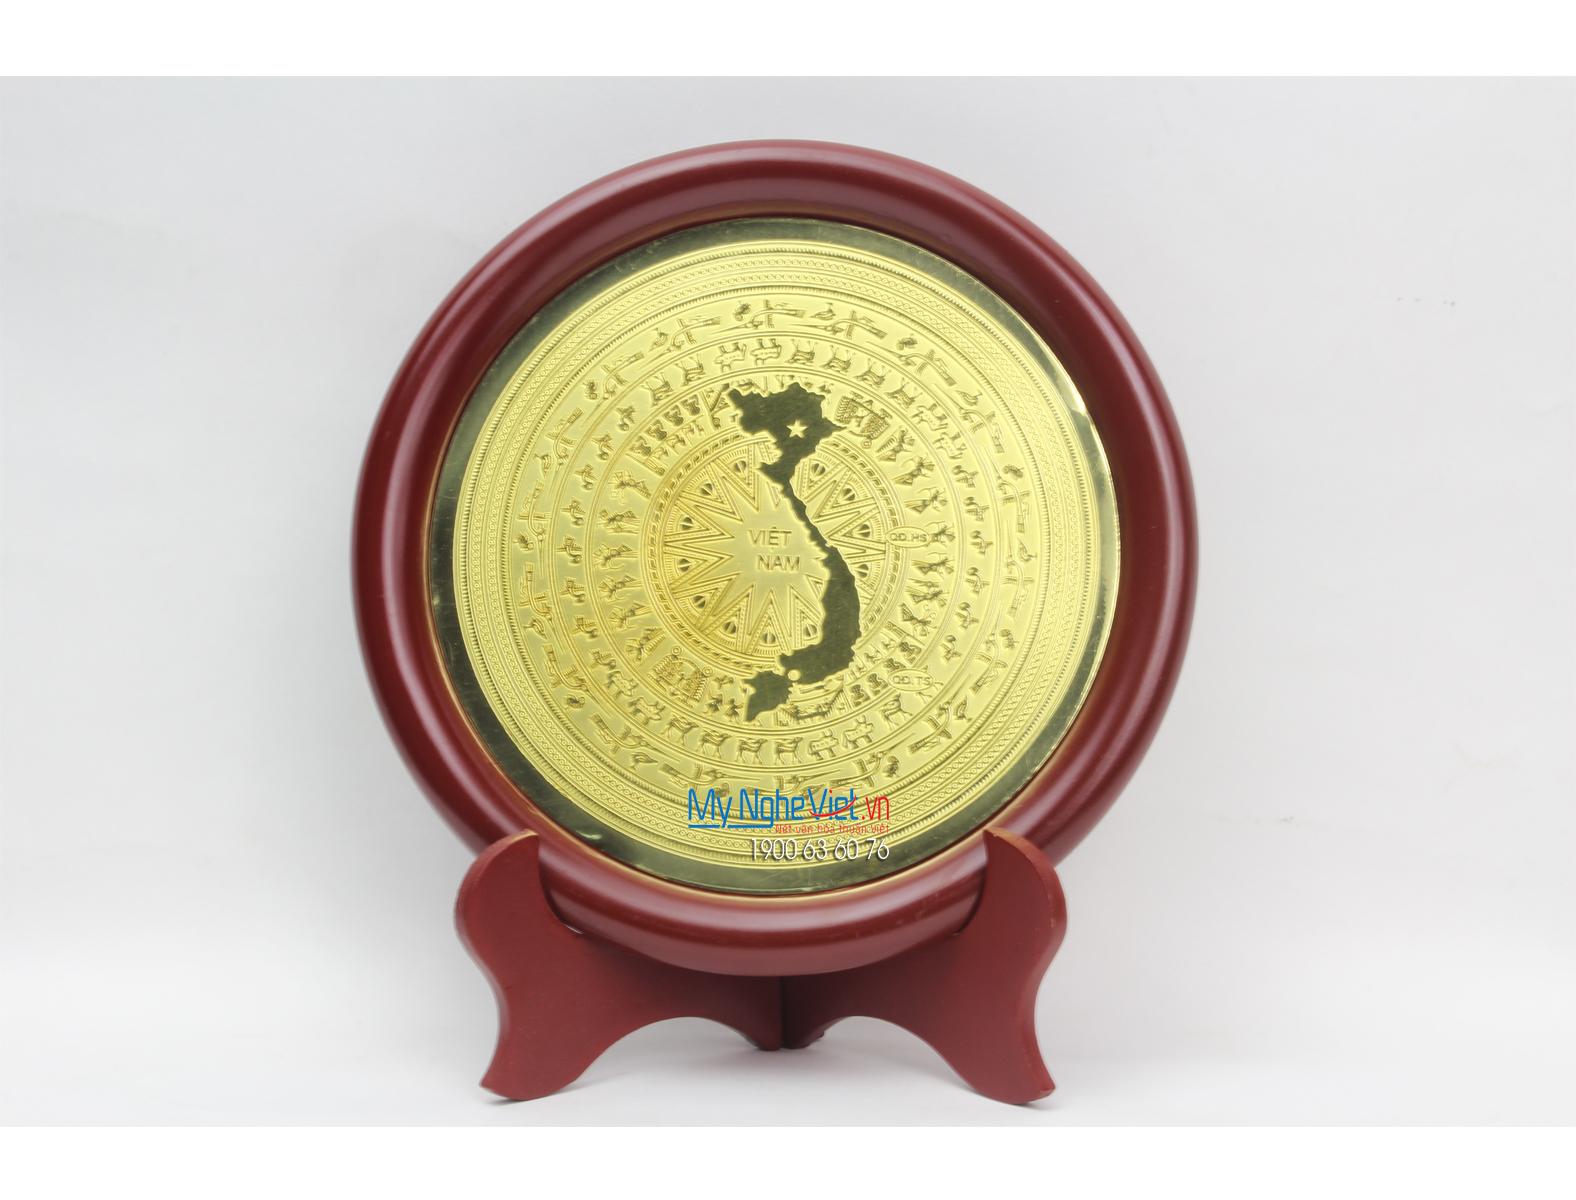 Đĩa đồng lưu niệm MNV-DD05